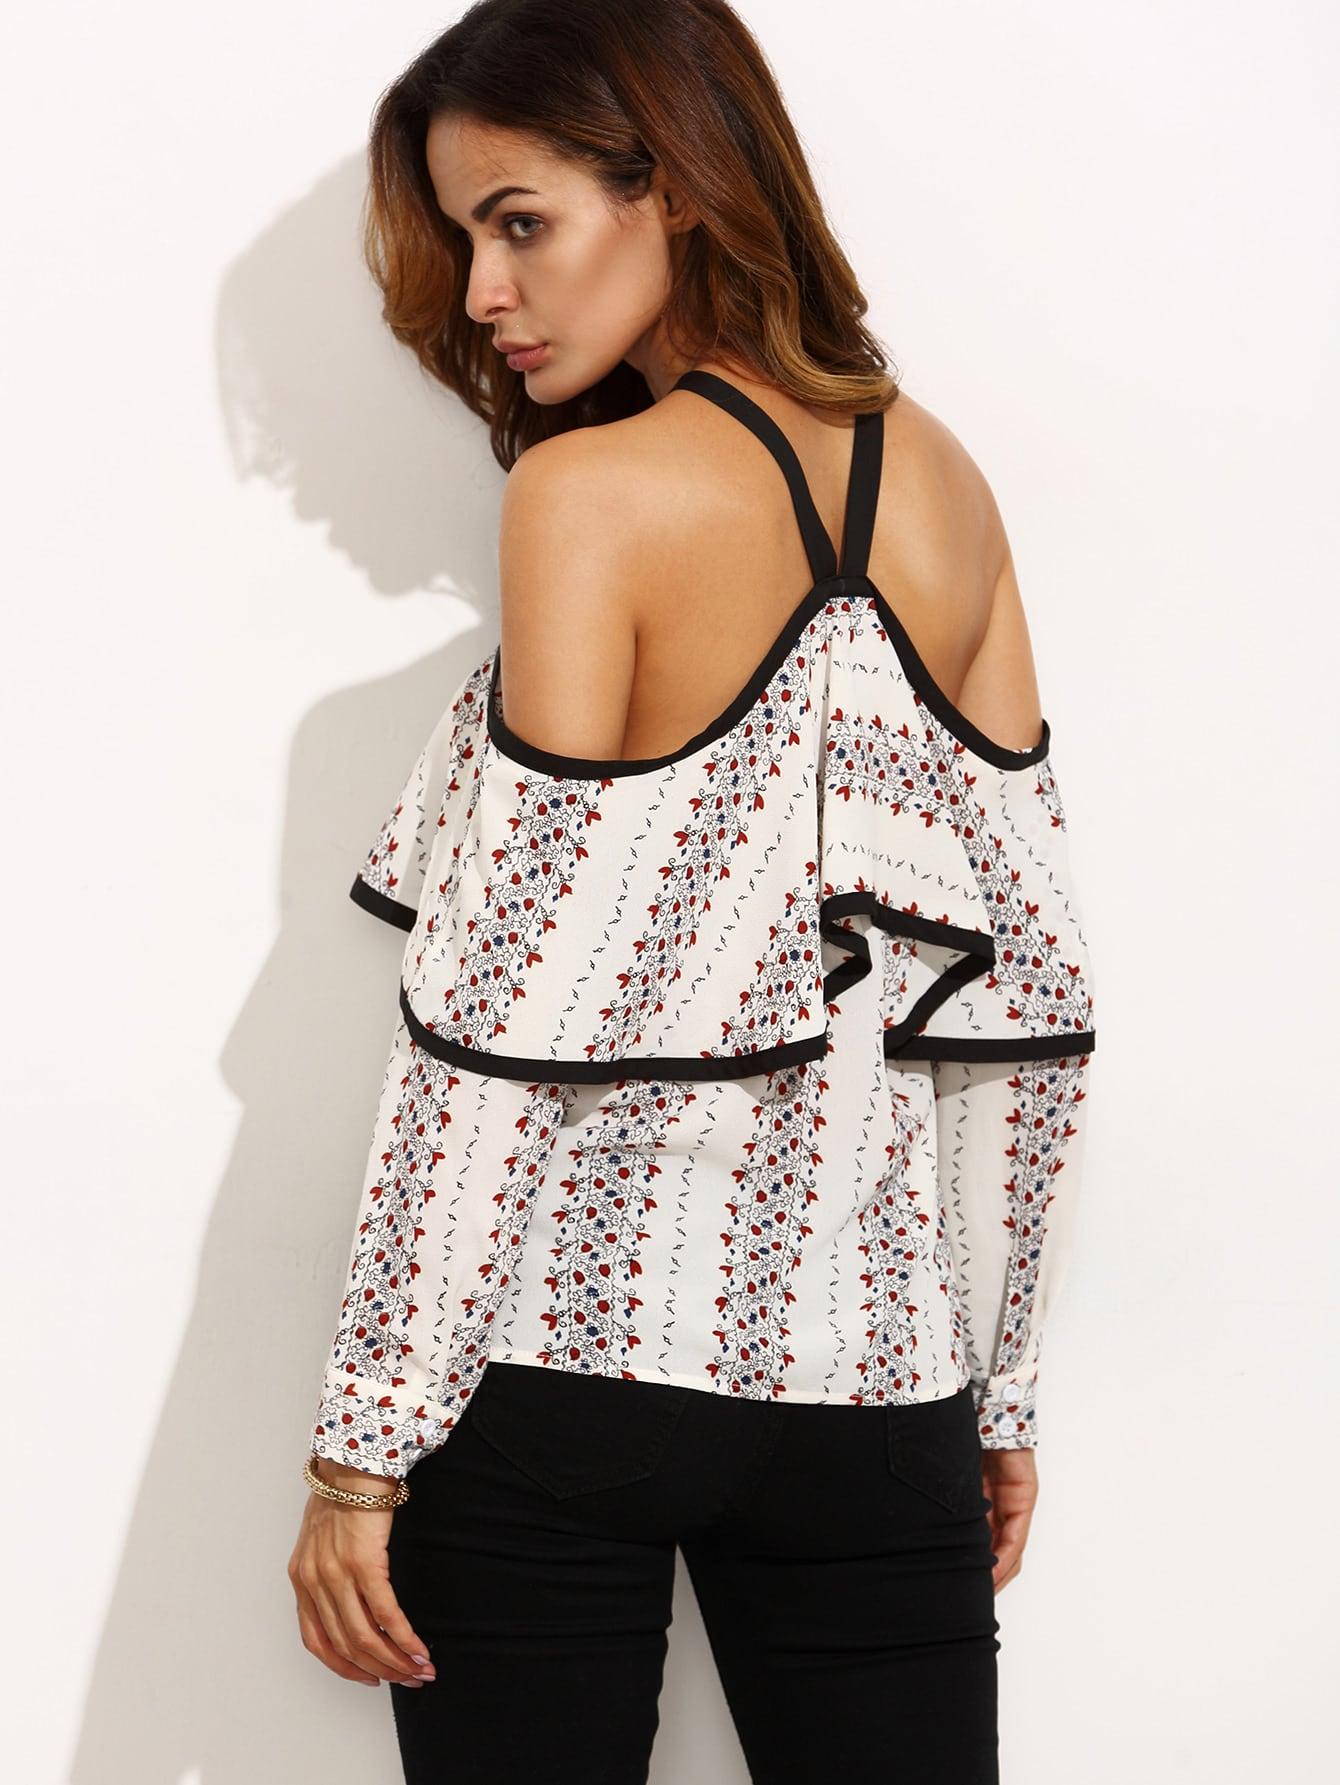 blouse160804503_2